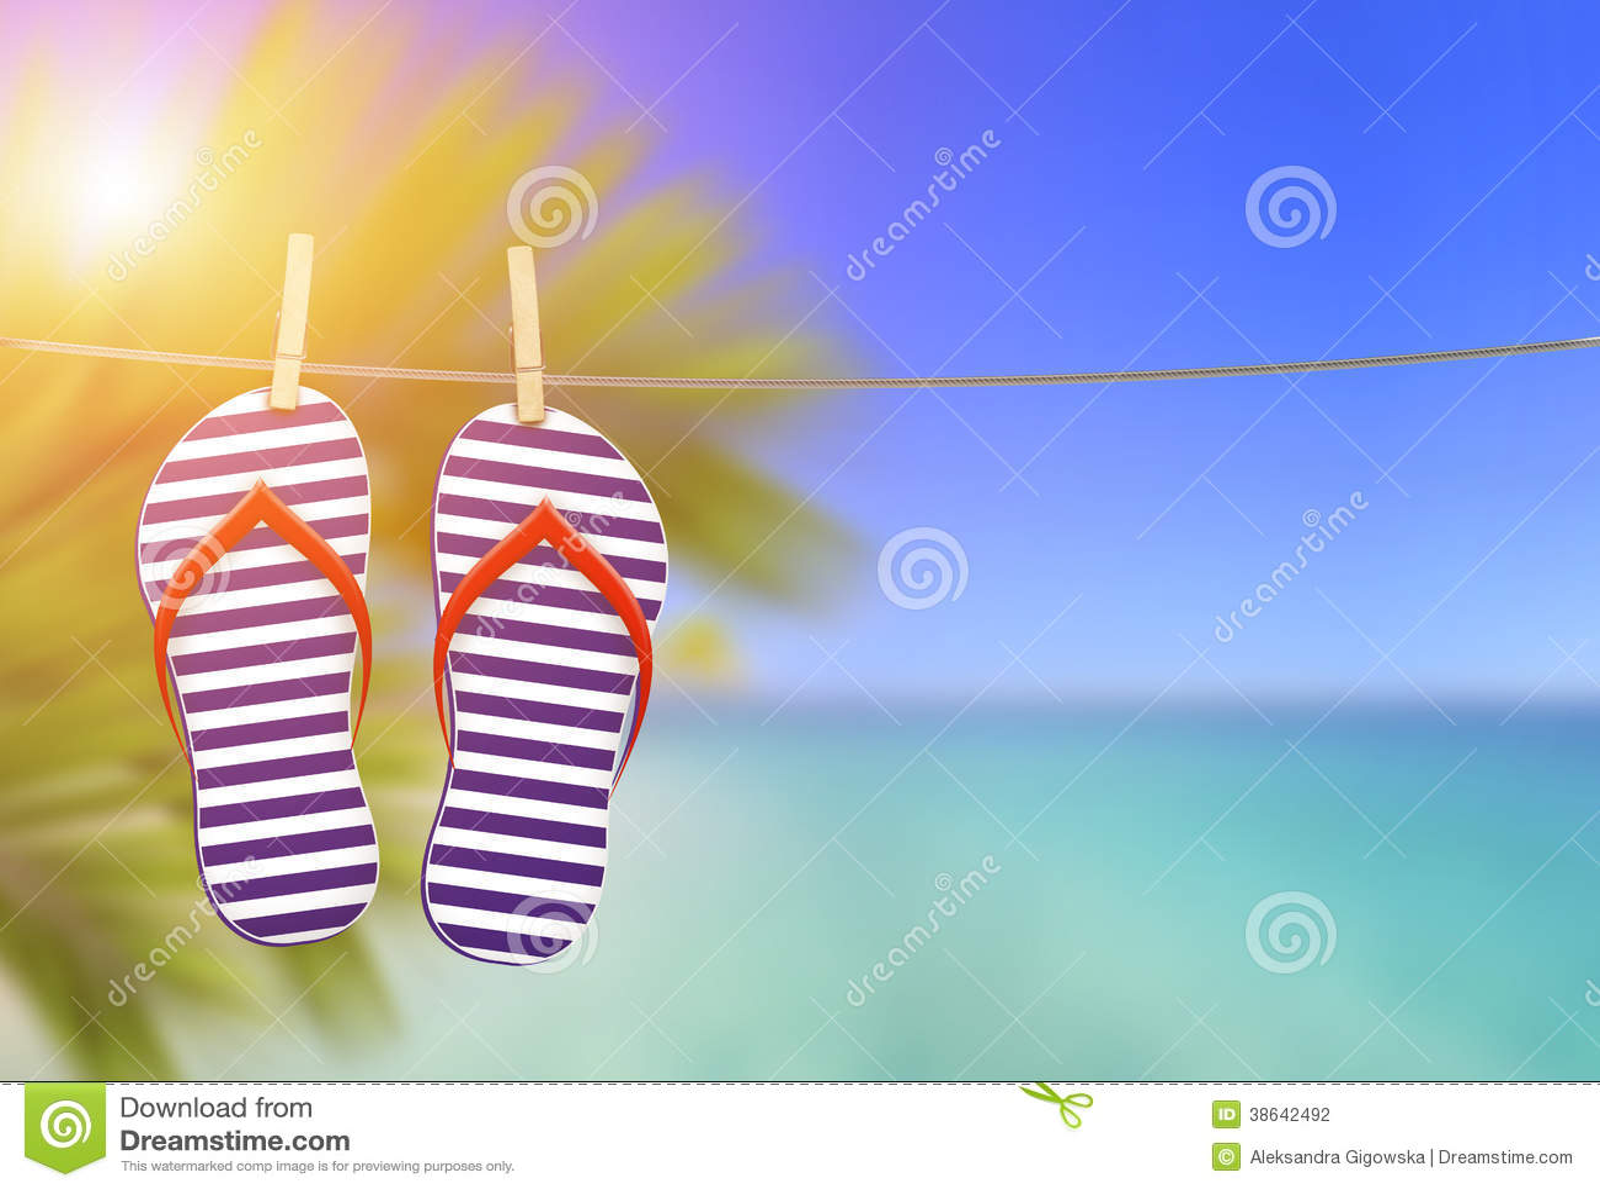 f552c1f356bcb3 Flip Flops On The Clothesline Stock Photo - Image of palm ...